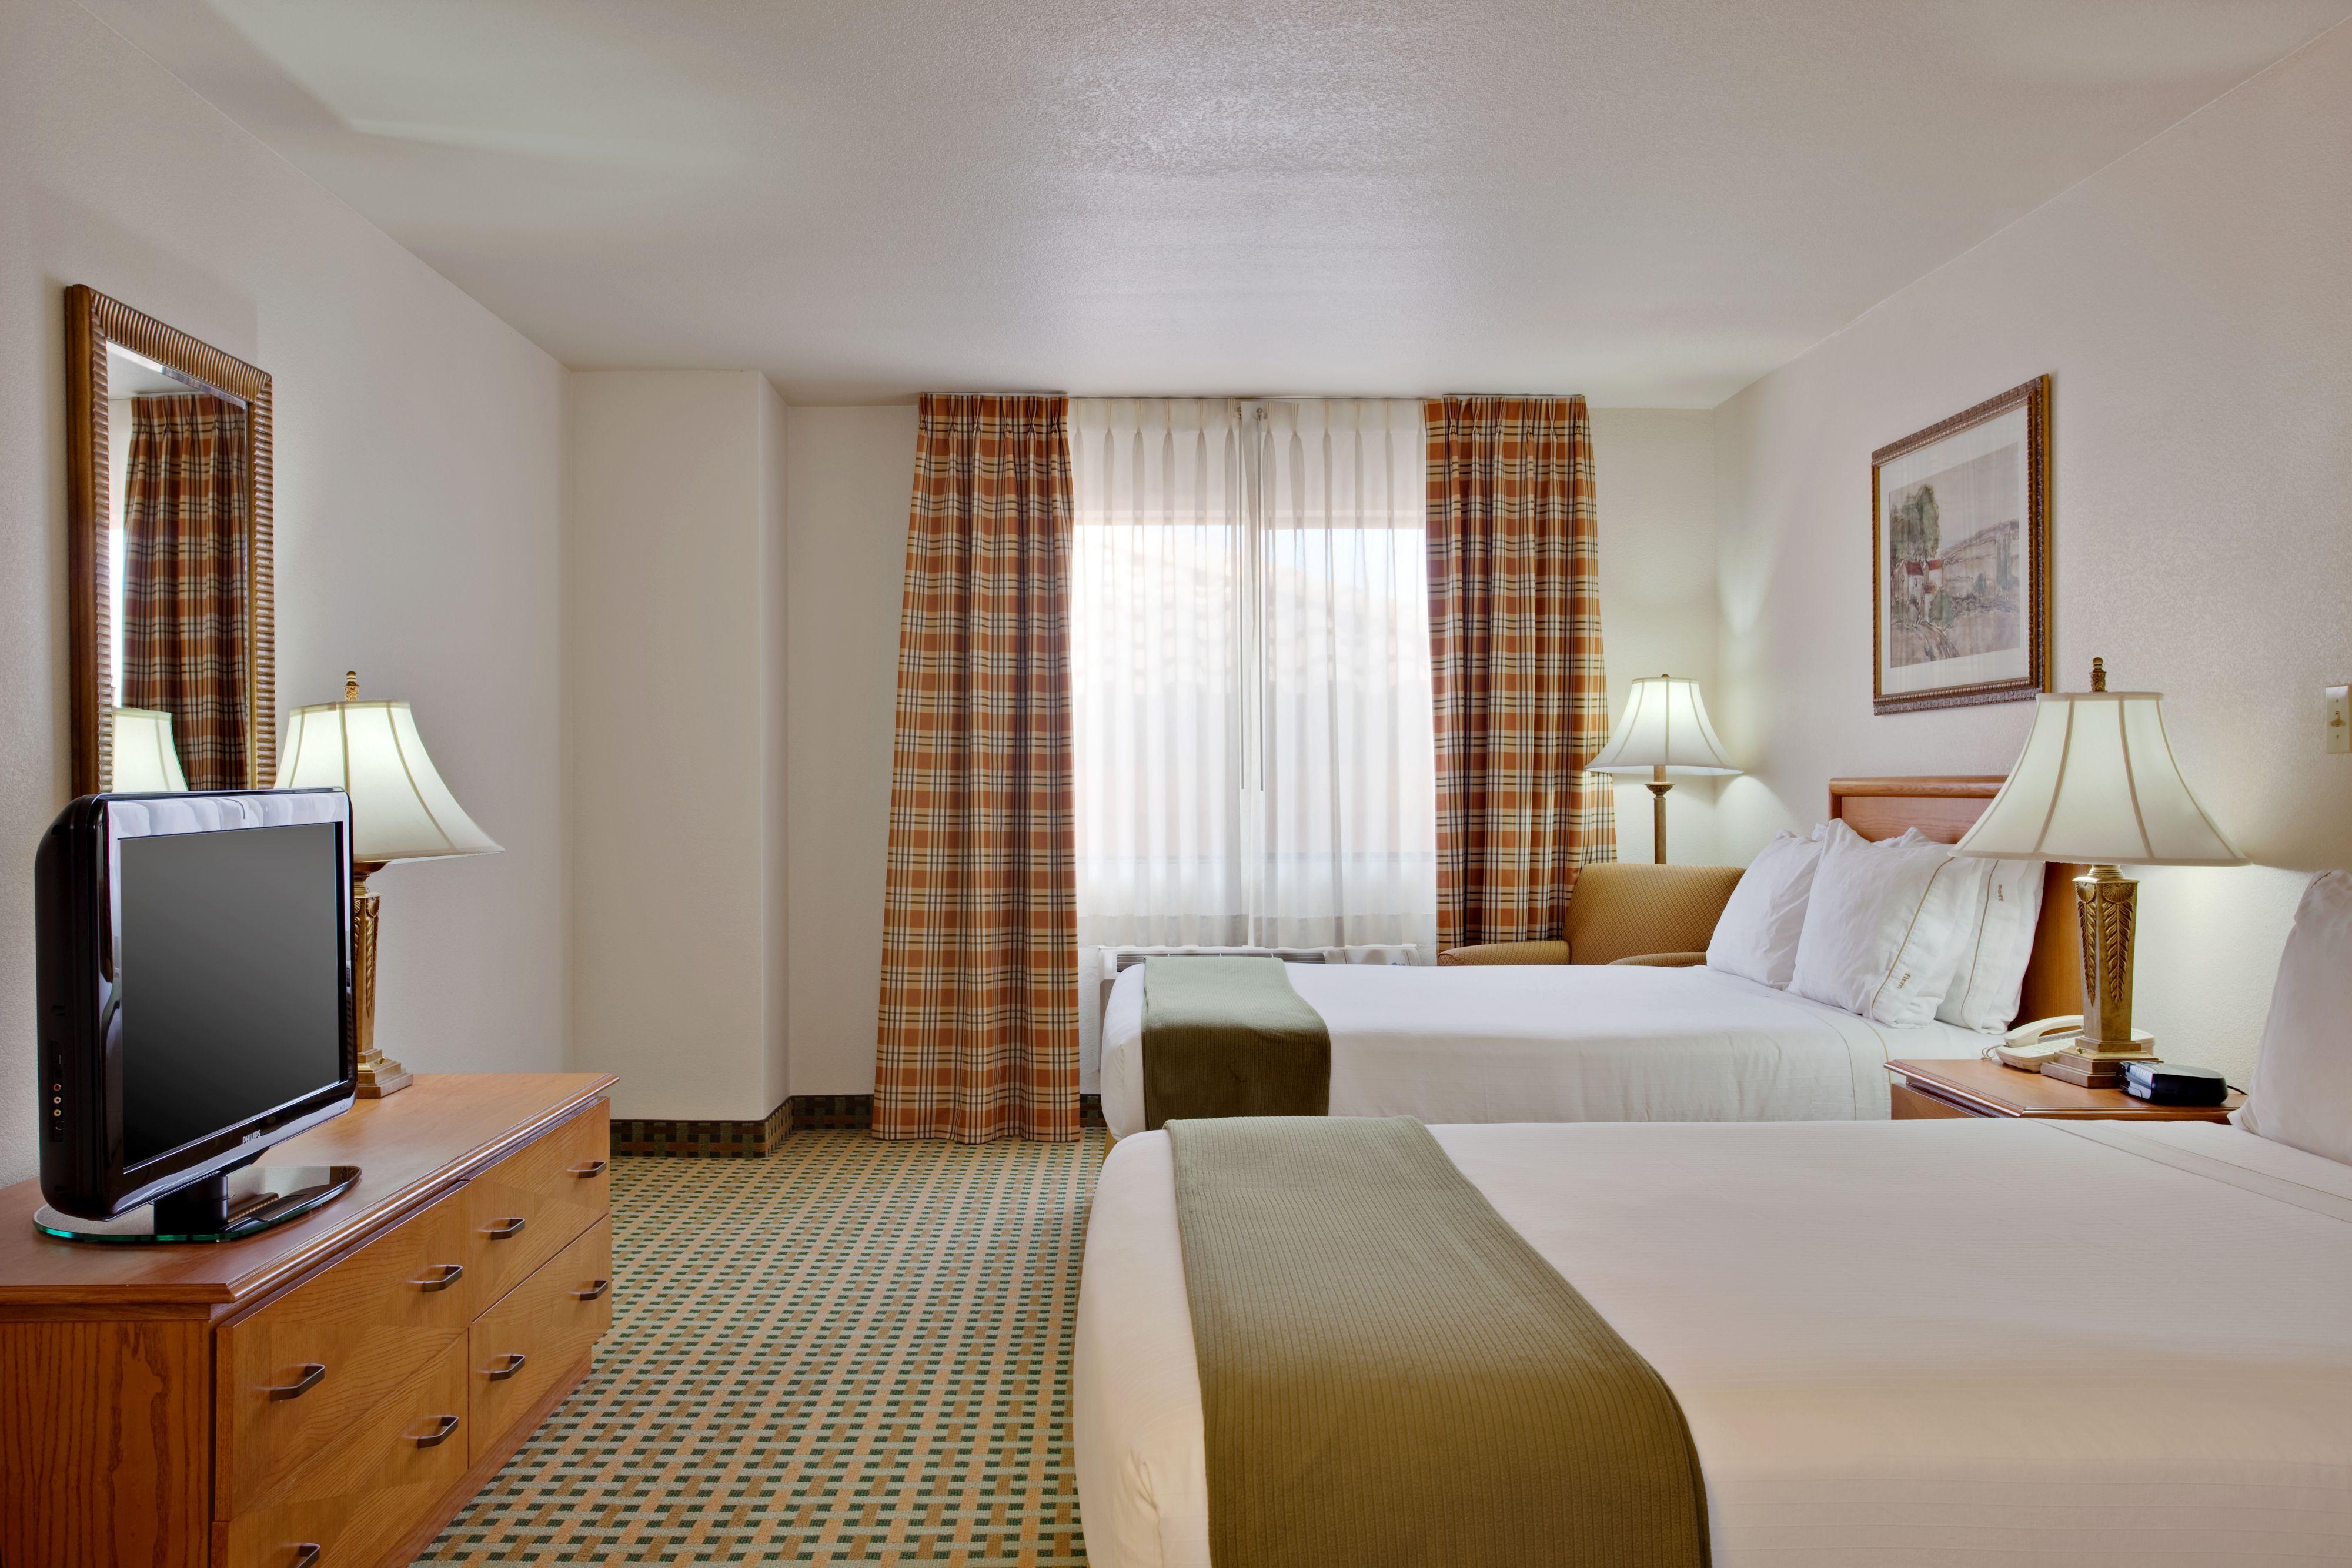 holiday-inn-express-and-suites-kingman-2531759484-original.jpg